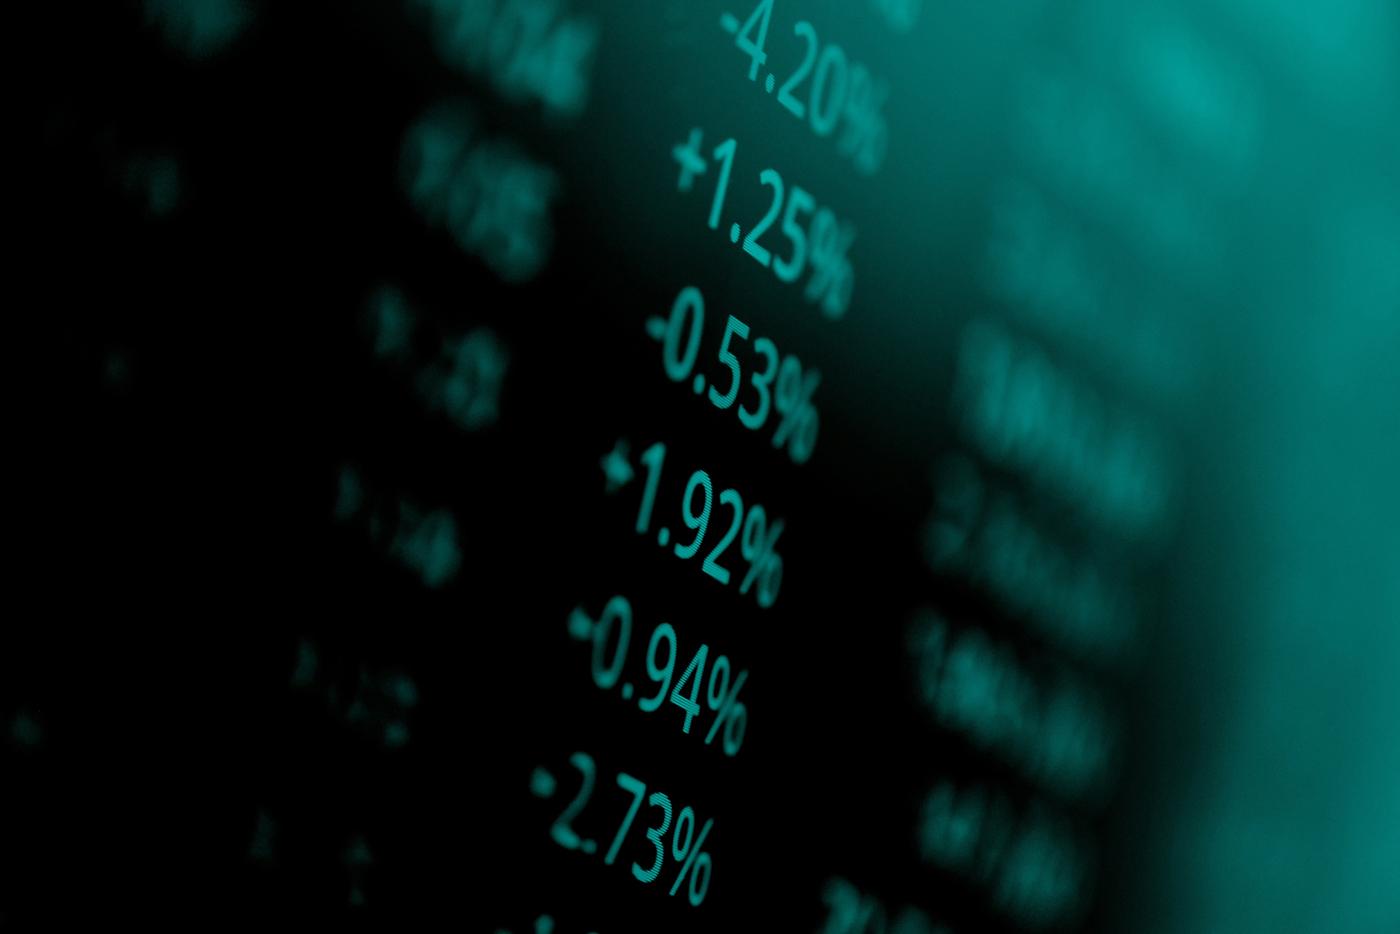 Stock Price Tickers, Stock Trading, Stock Market, Stocks to BUy